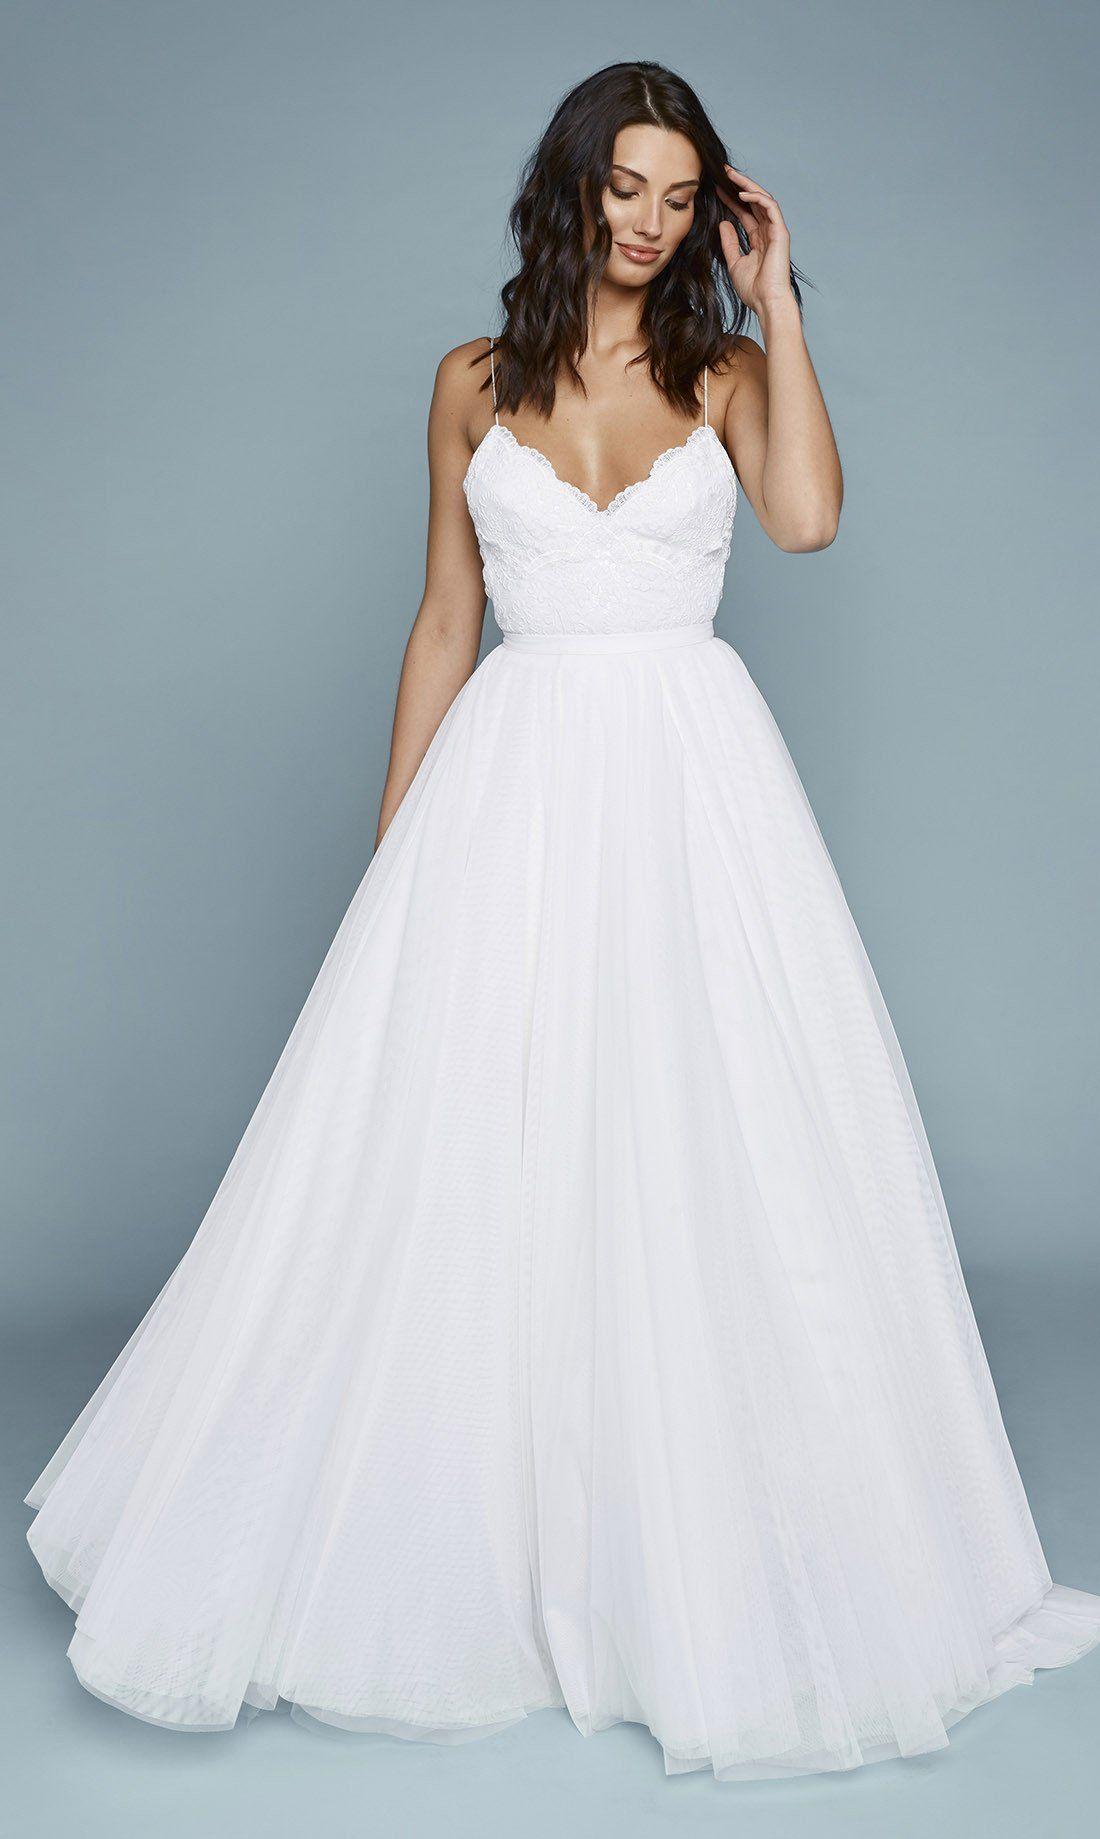 41++ Overskirt wedding dress pattern information